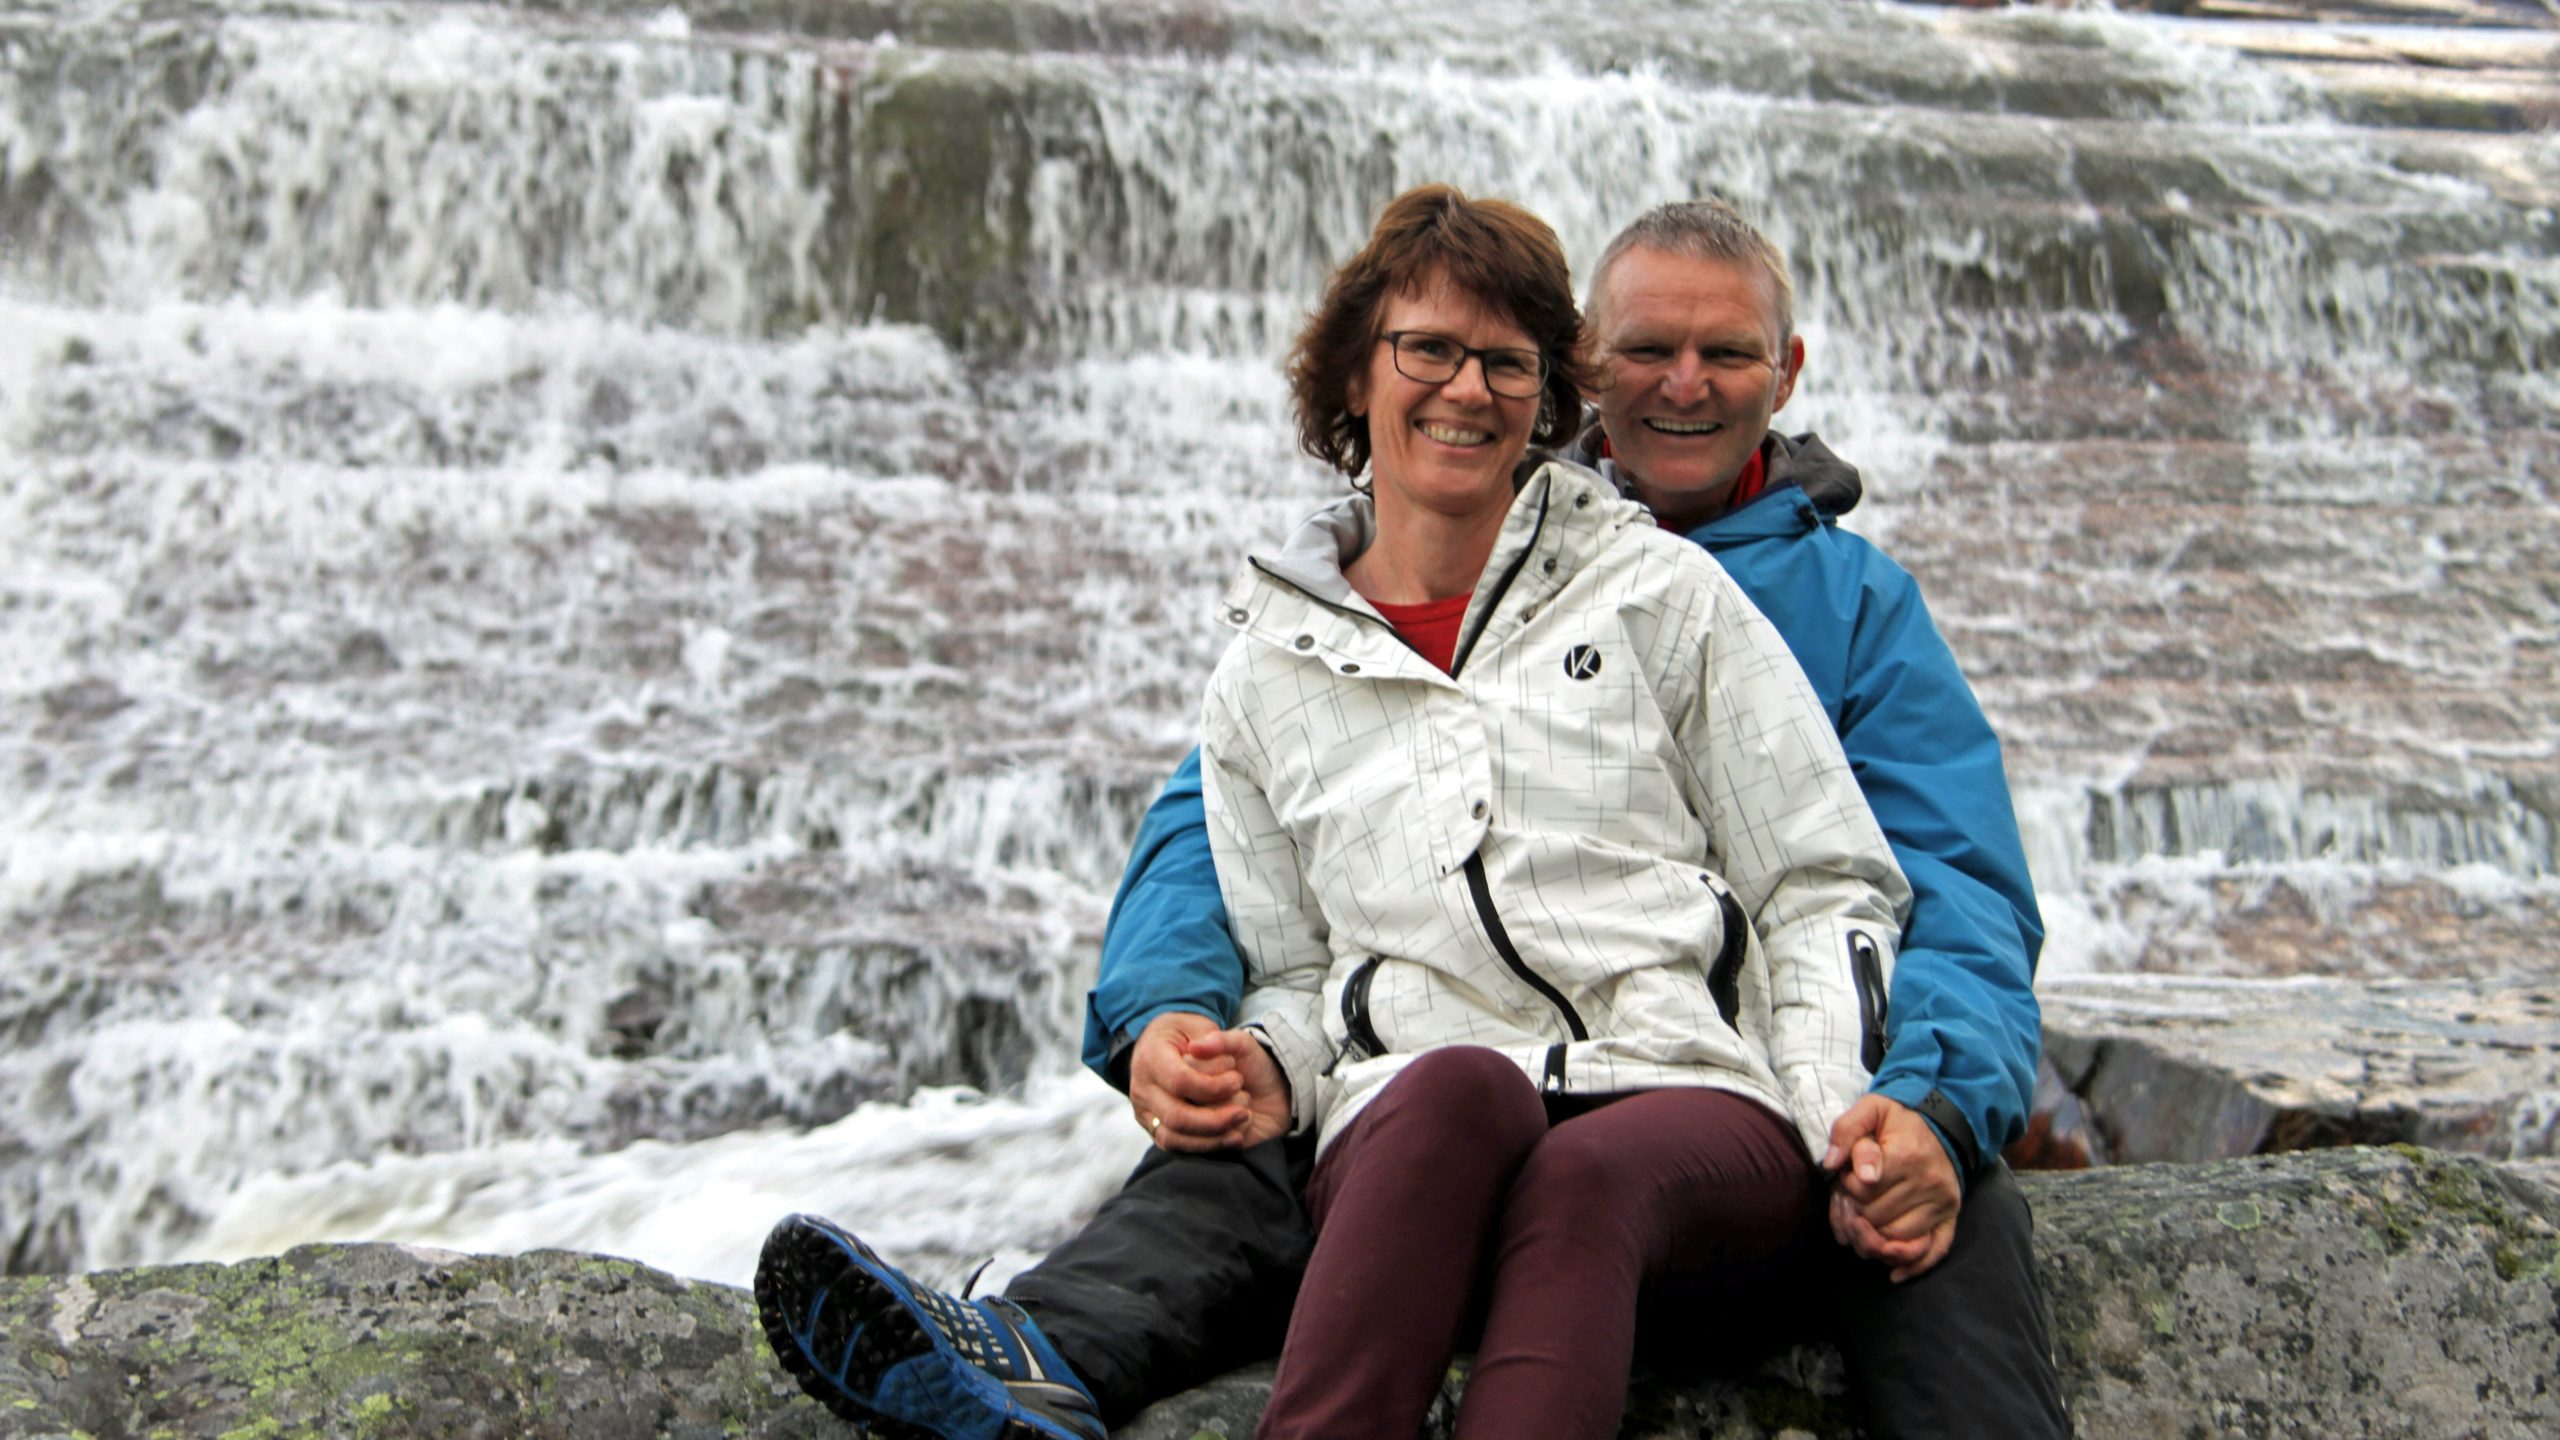 Bjørg og Trond Hjort er vertskap 25. juli 18:00.